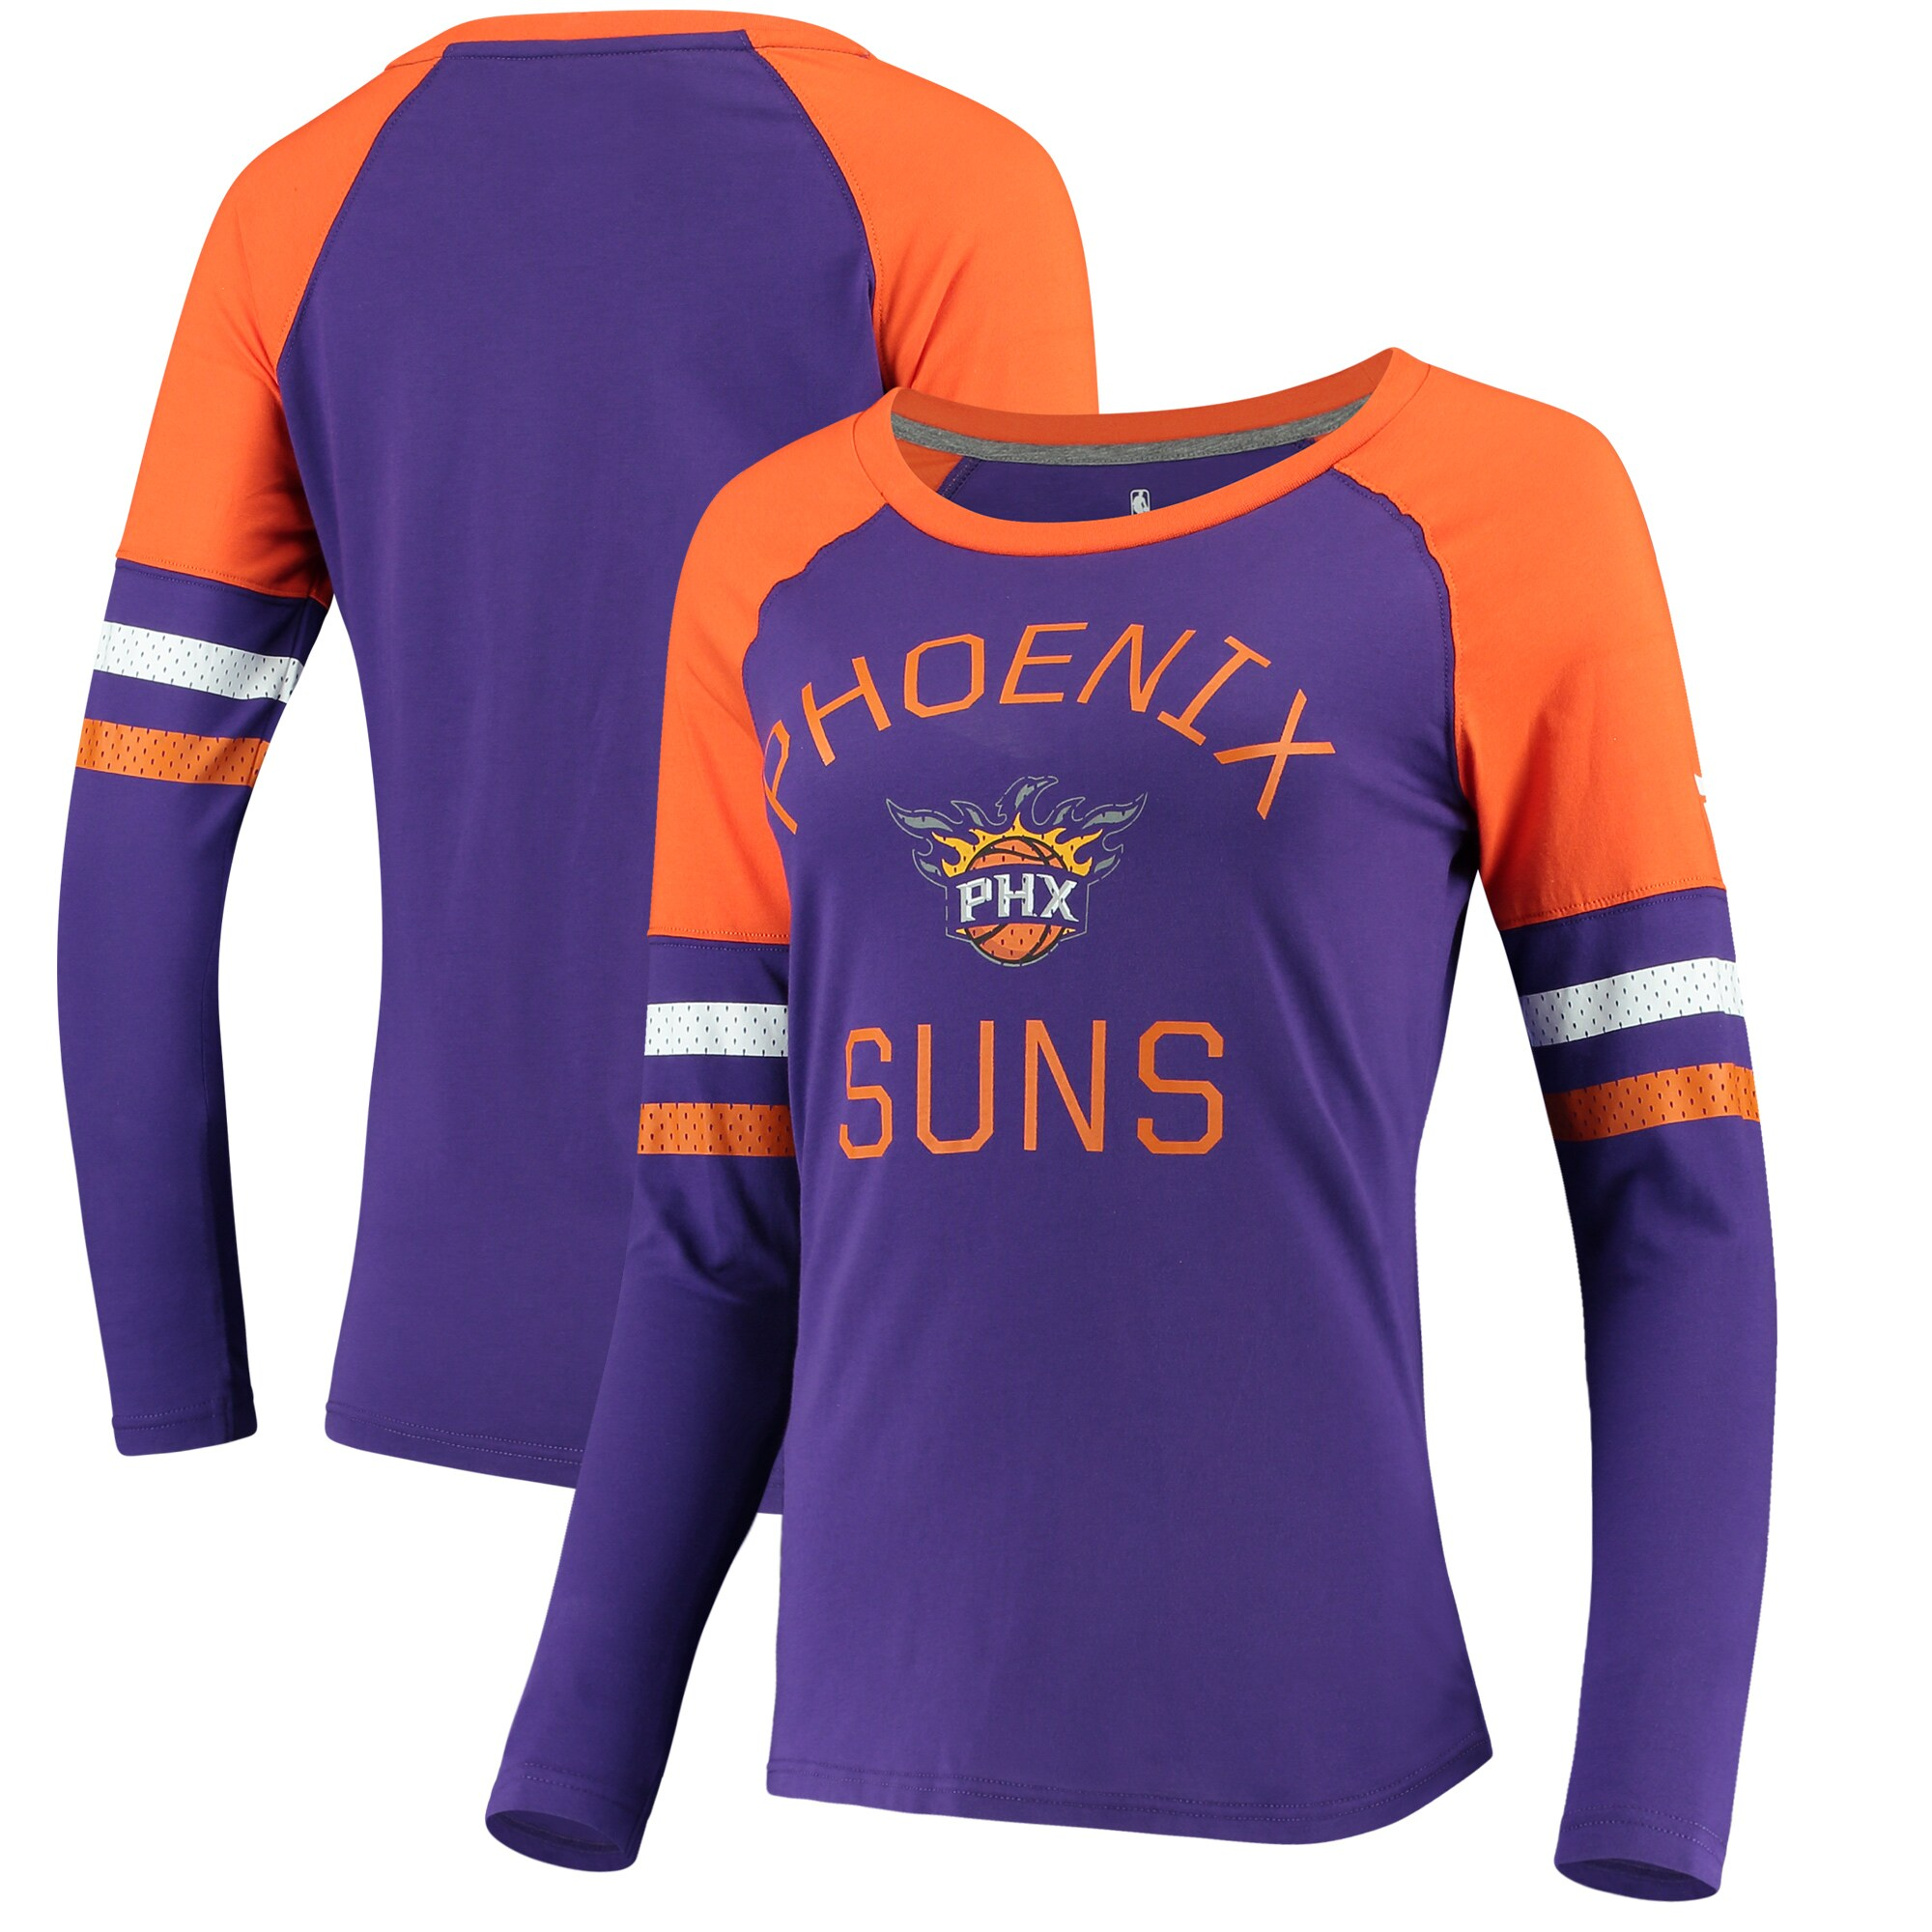 Phoenix Suns Fanatics Branded Women's Iconic Long Sleeve T-Shirt - Purple/Orange